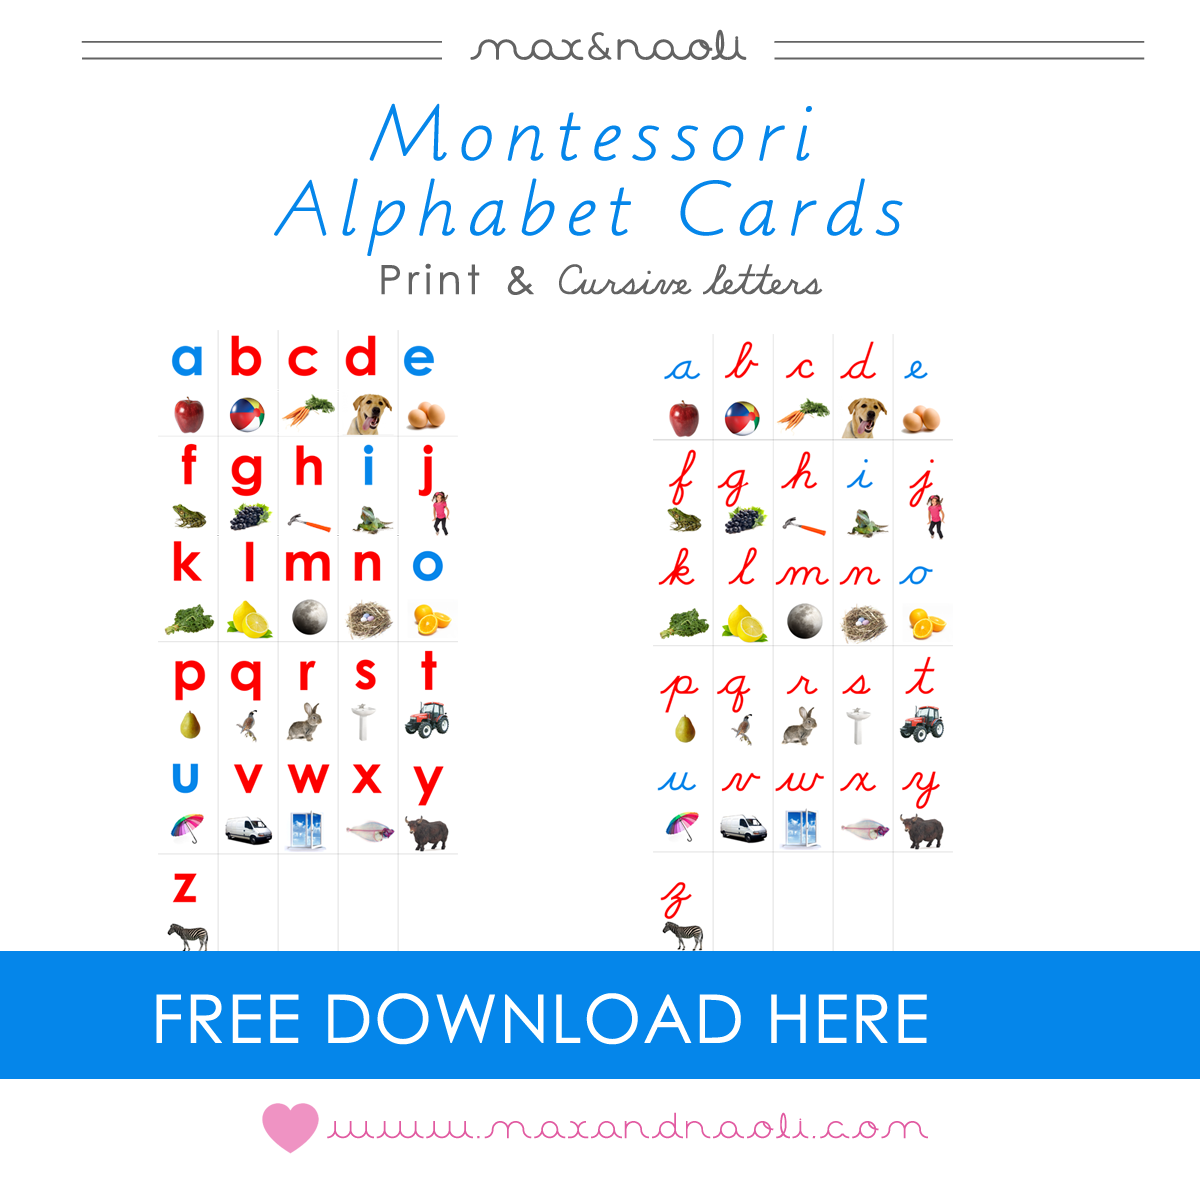 Free Montessori Alphabet Cards With Print And Cursive